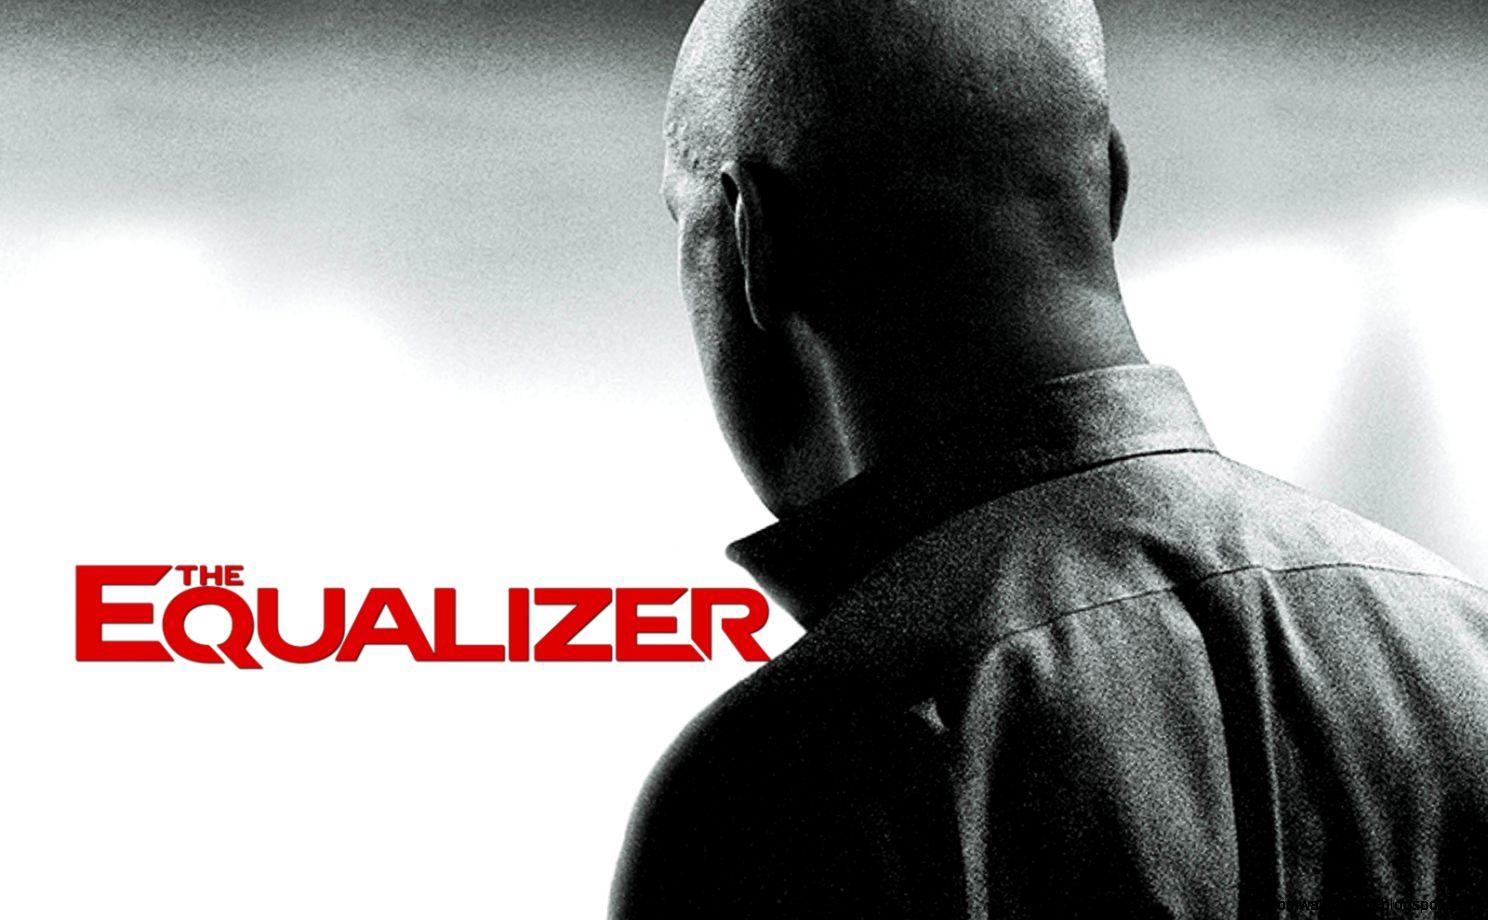 The Equalizer HD Desktop Wallpapers